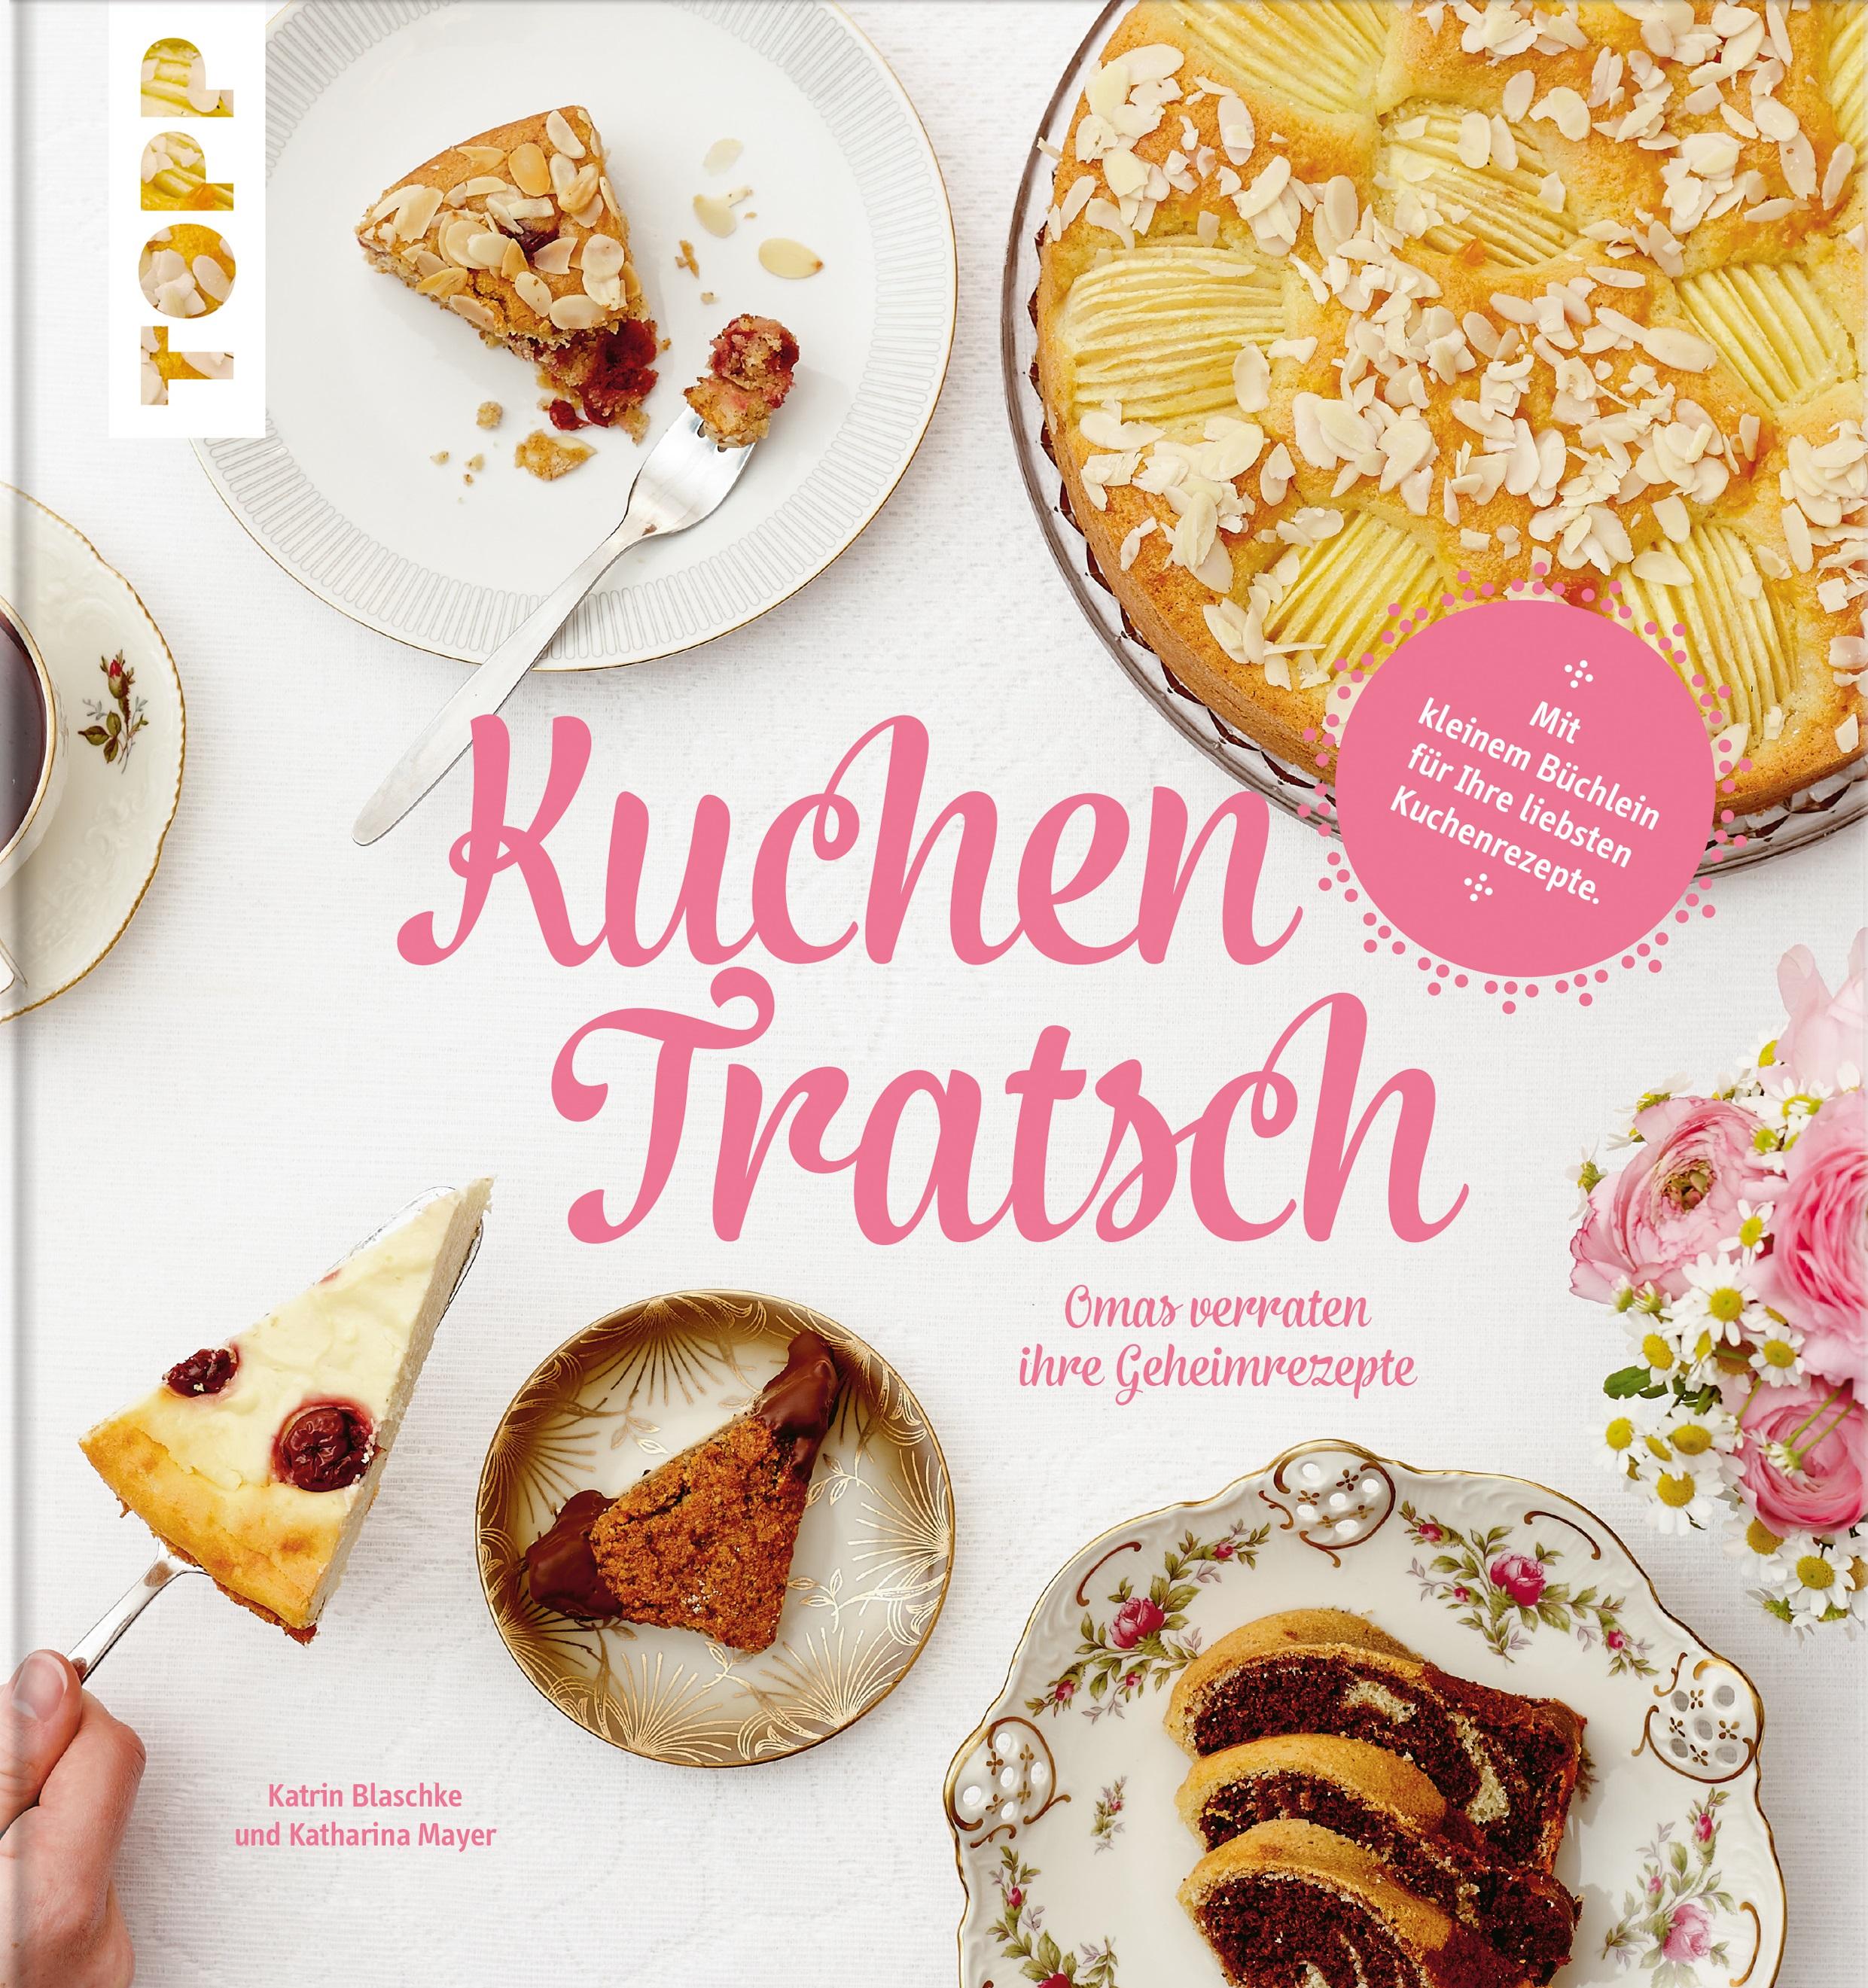 Kuchentratsch Omas Kuchenrezepte Bucherquelle